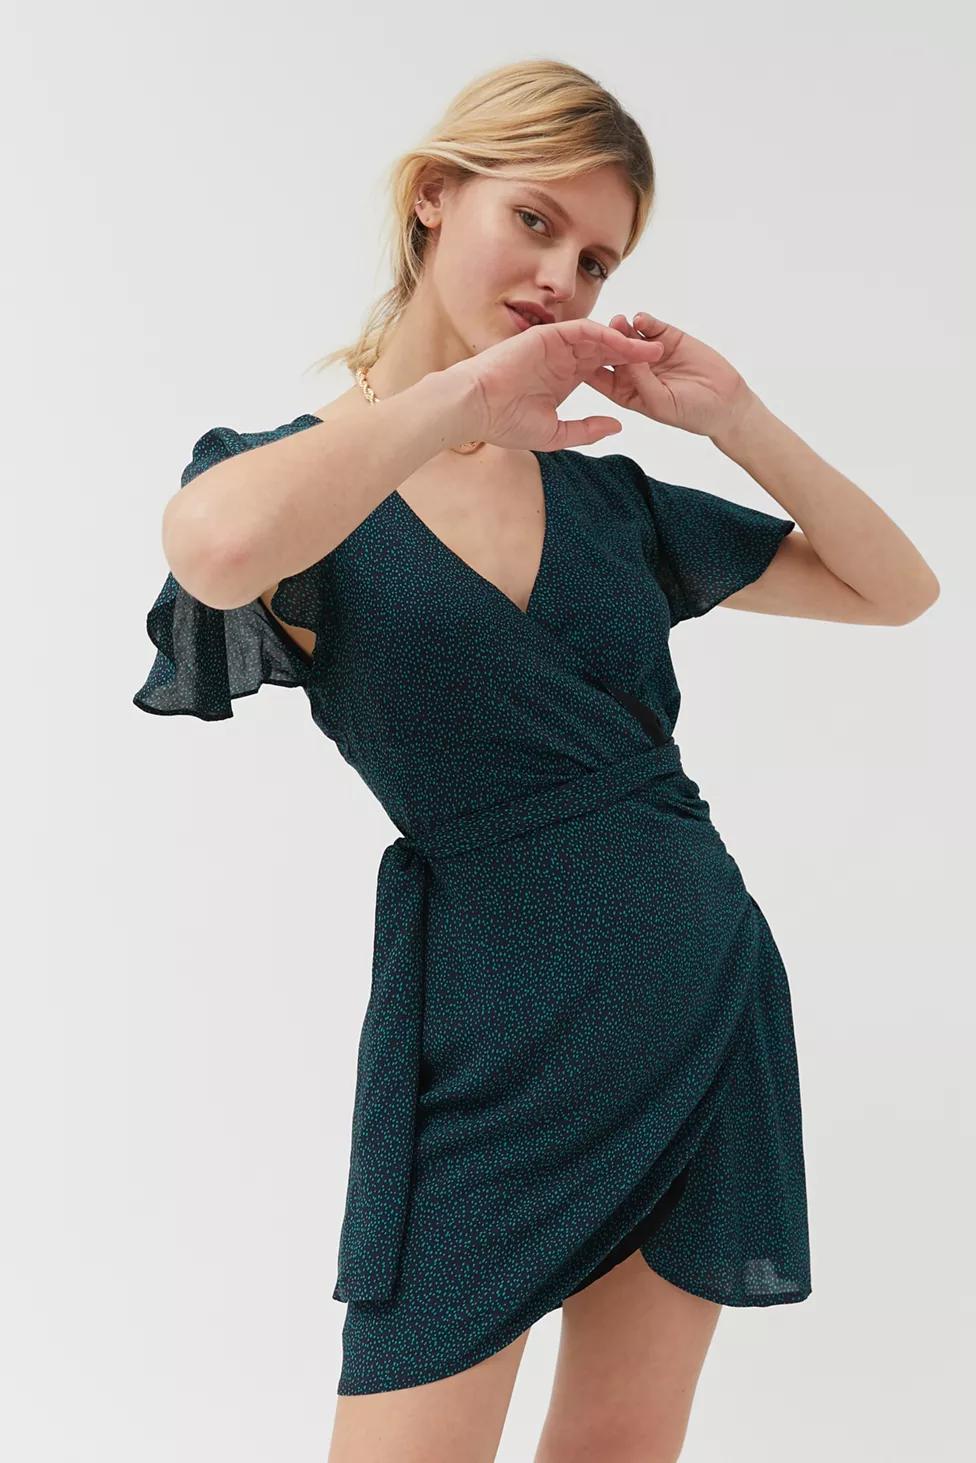 Dress Forum Surplice Wrap Dress Surplice Wrap Dress Wrap Dress Womens Midi Dresses [ 1463 x 976 Pixel ]